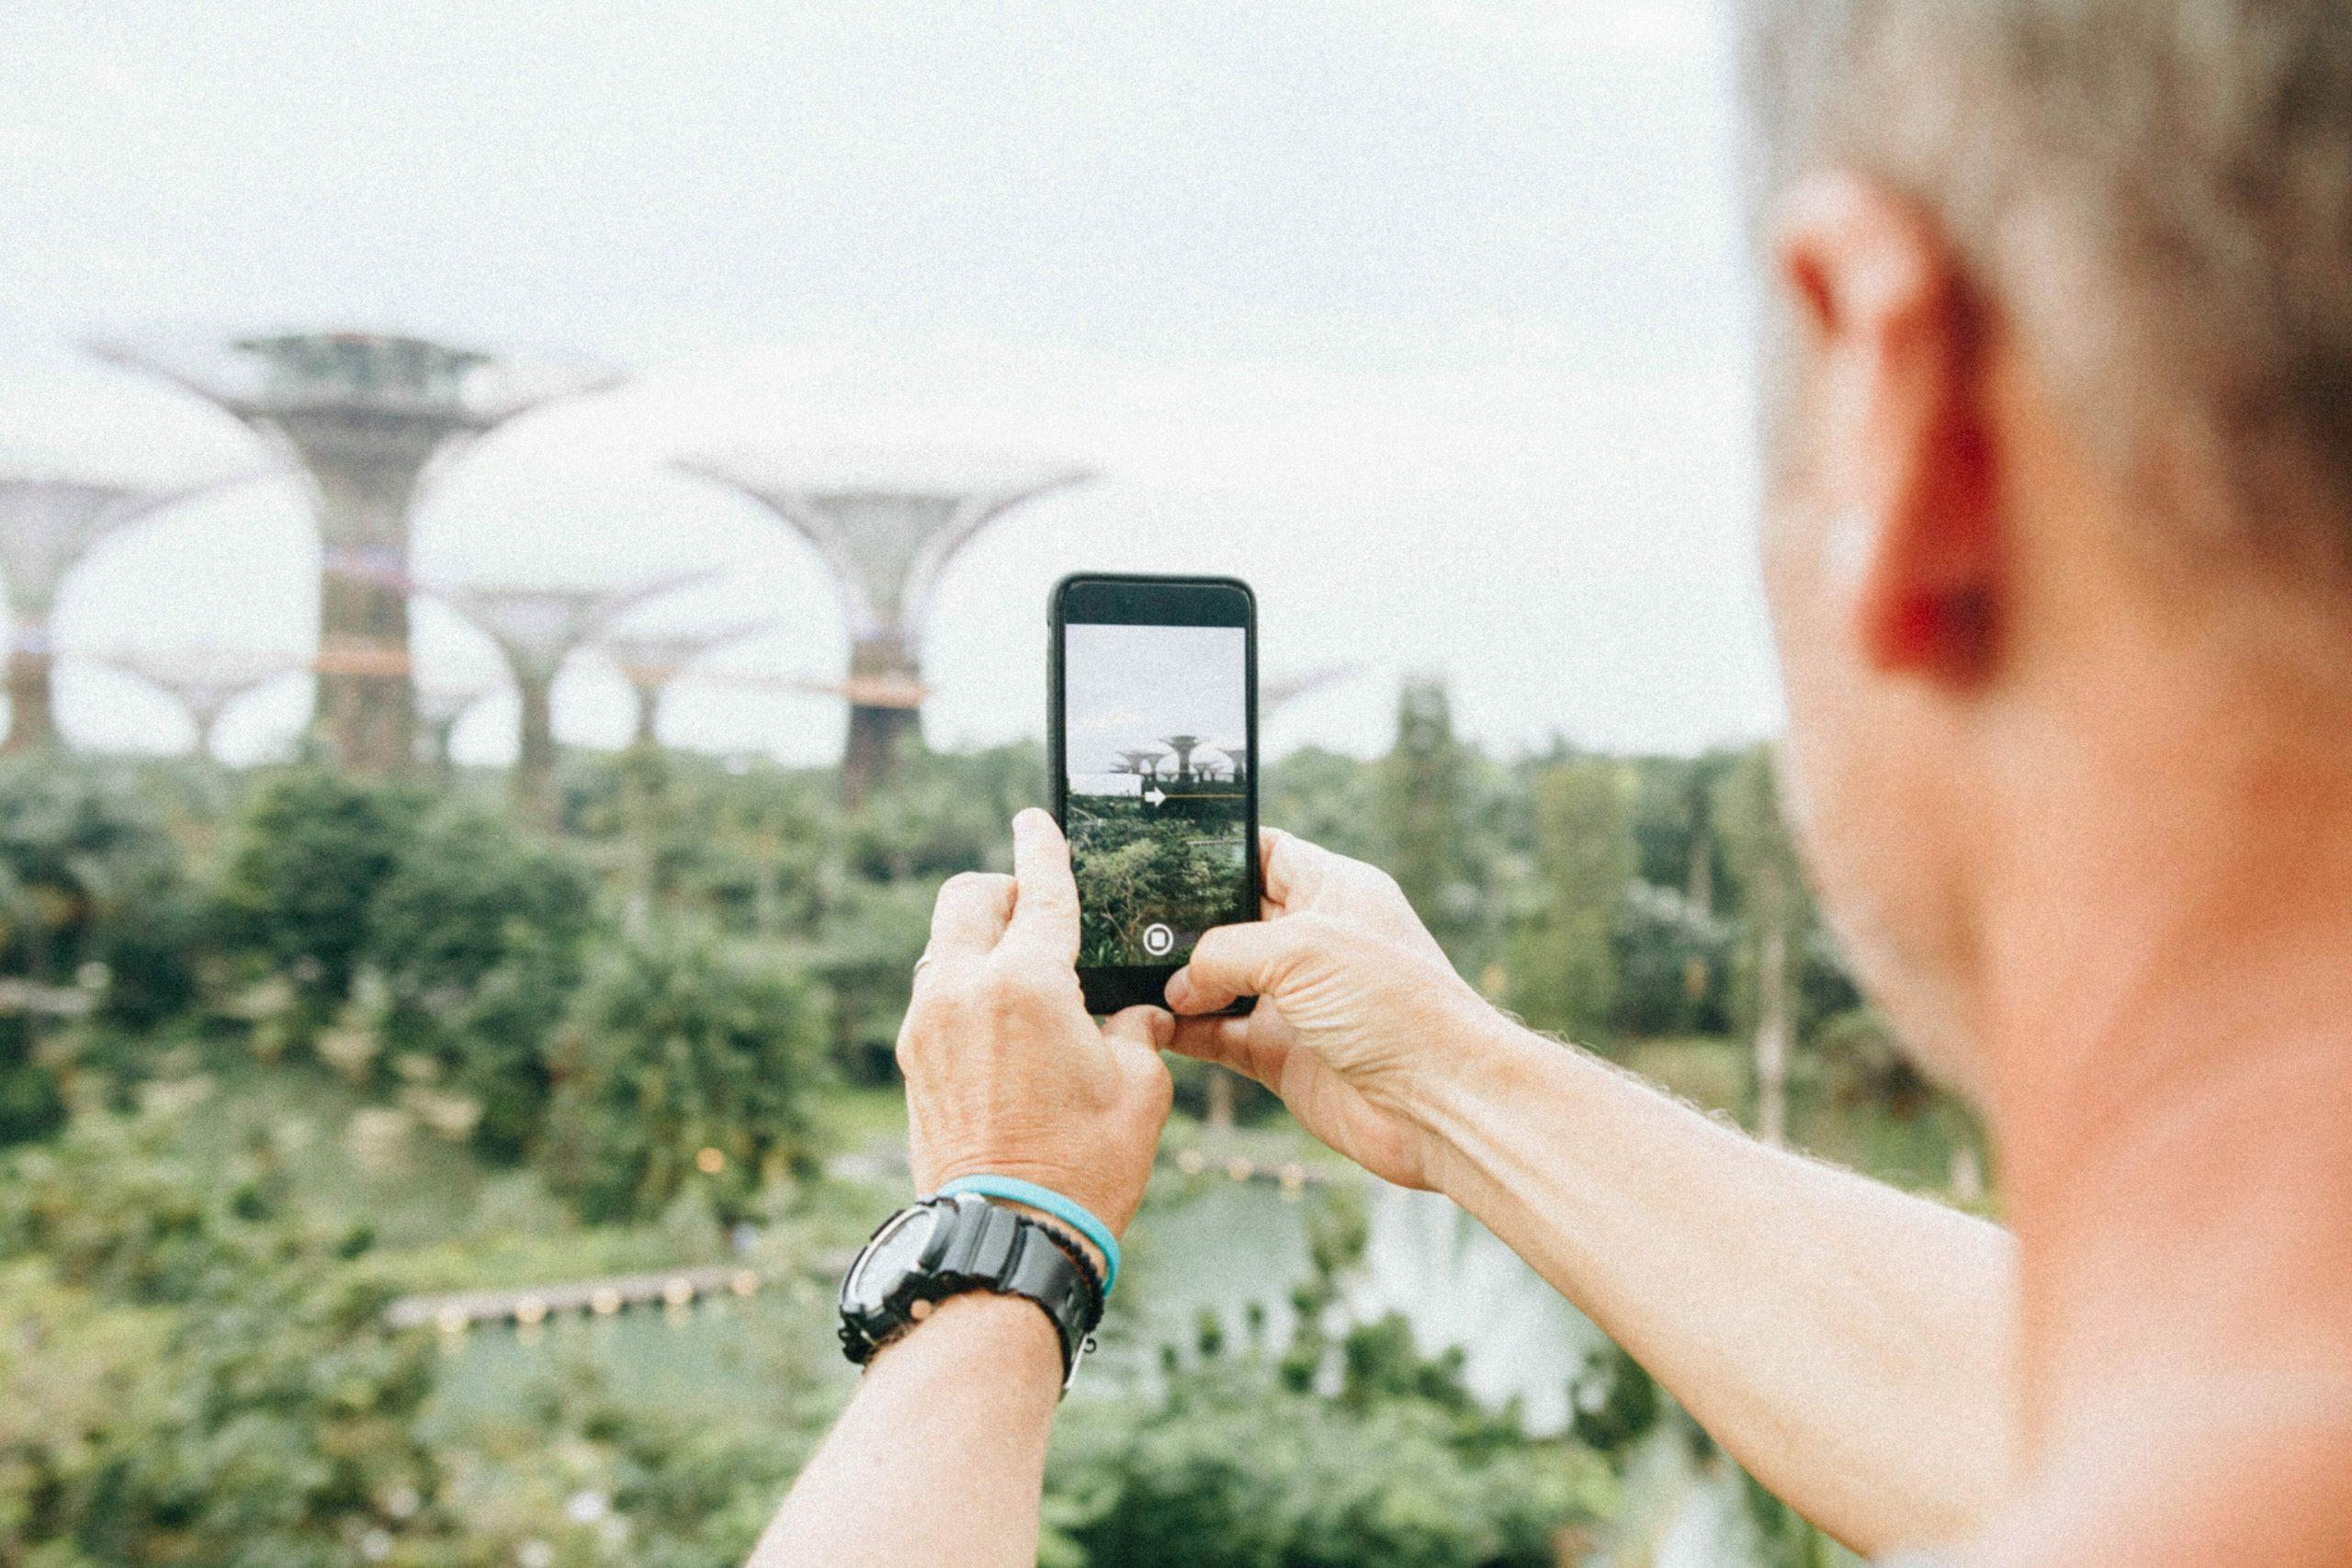 Filming Better Instagram Stories (Tips)